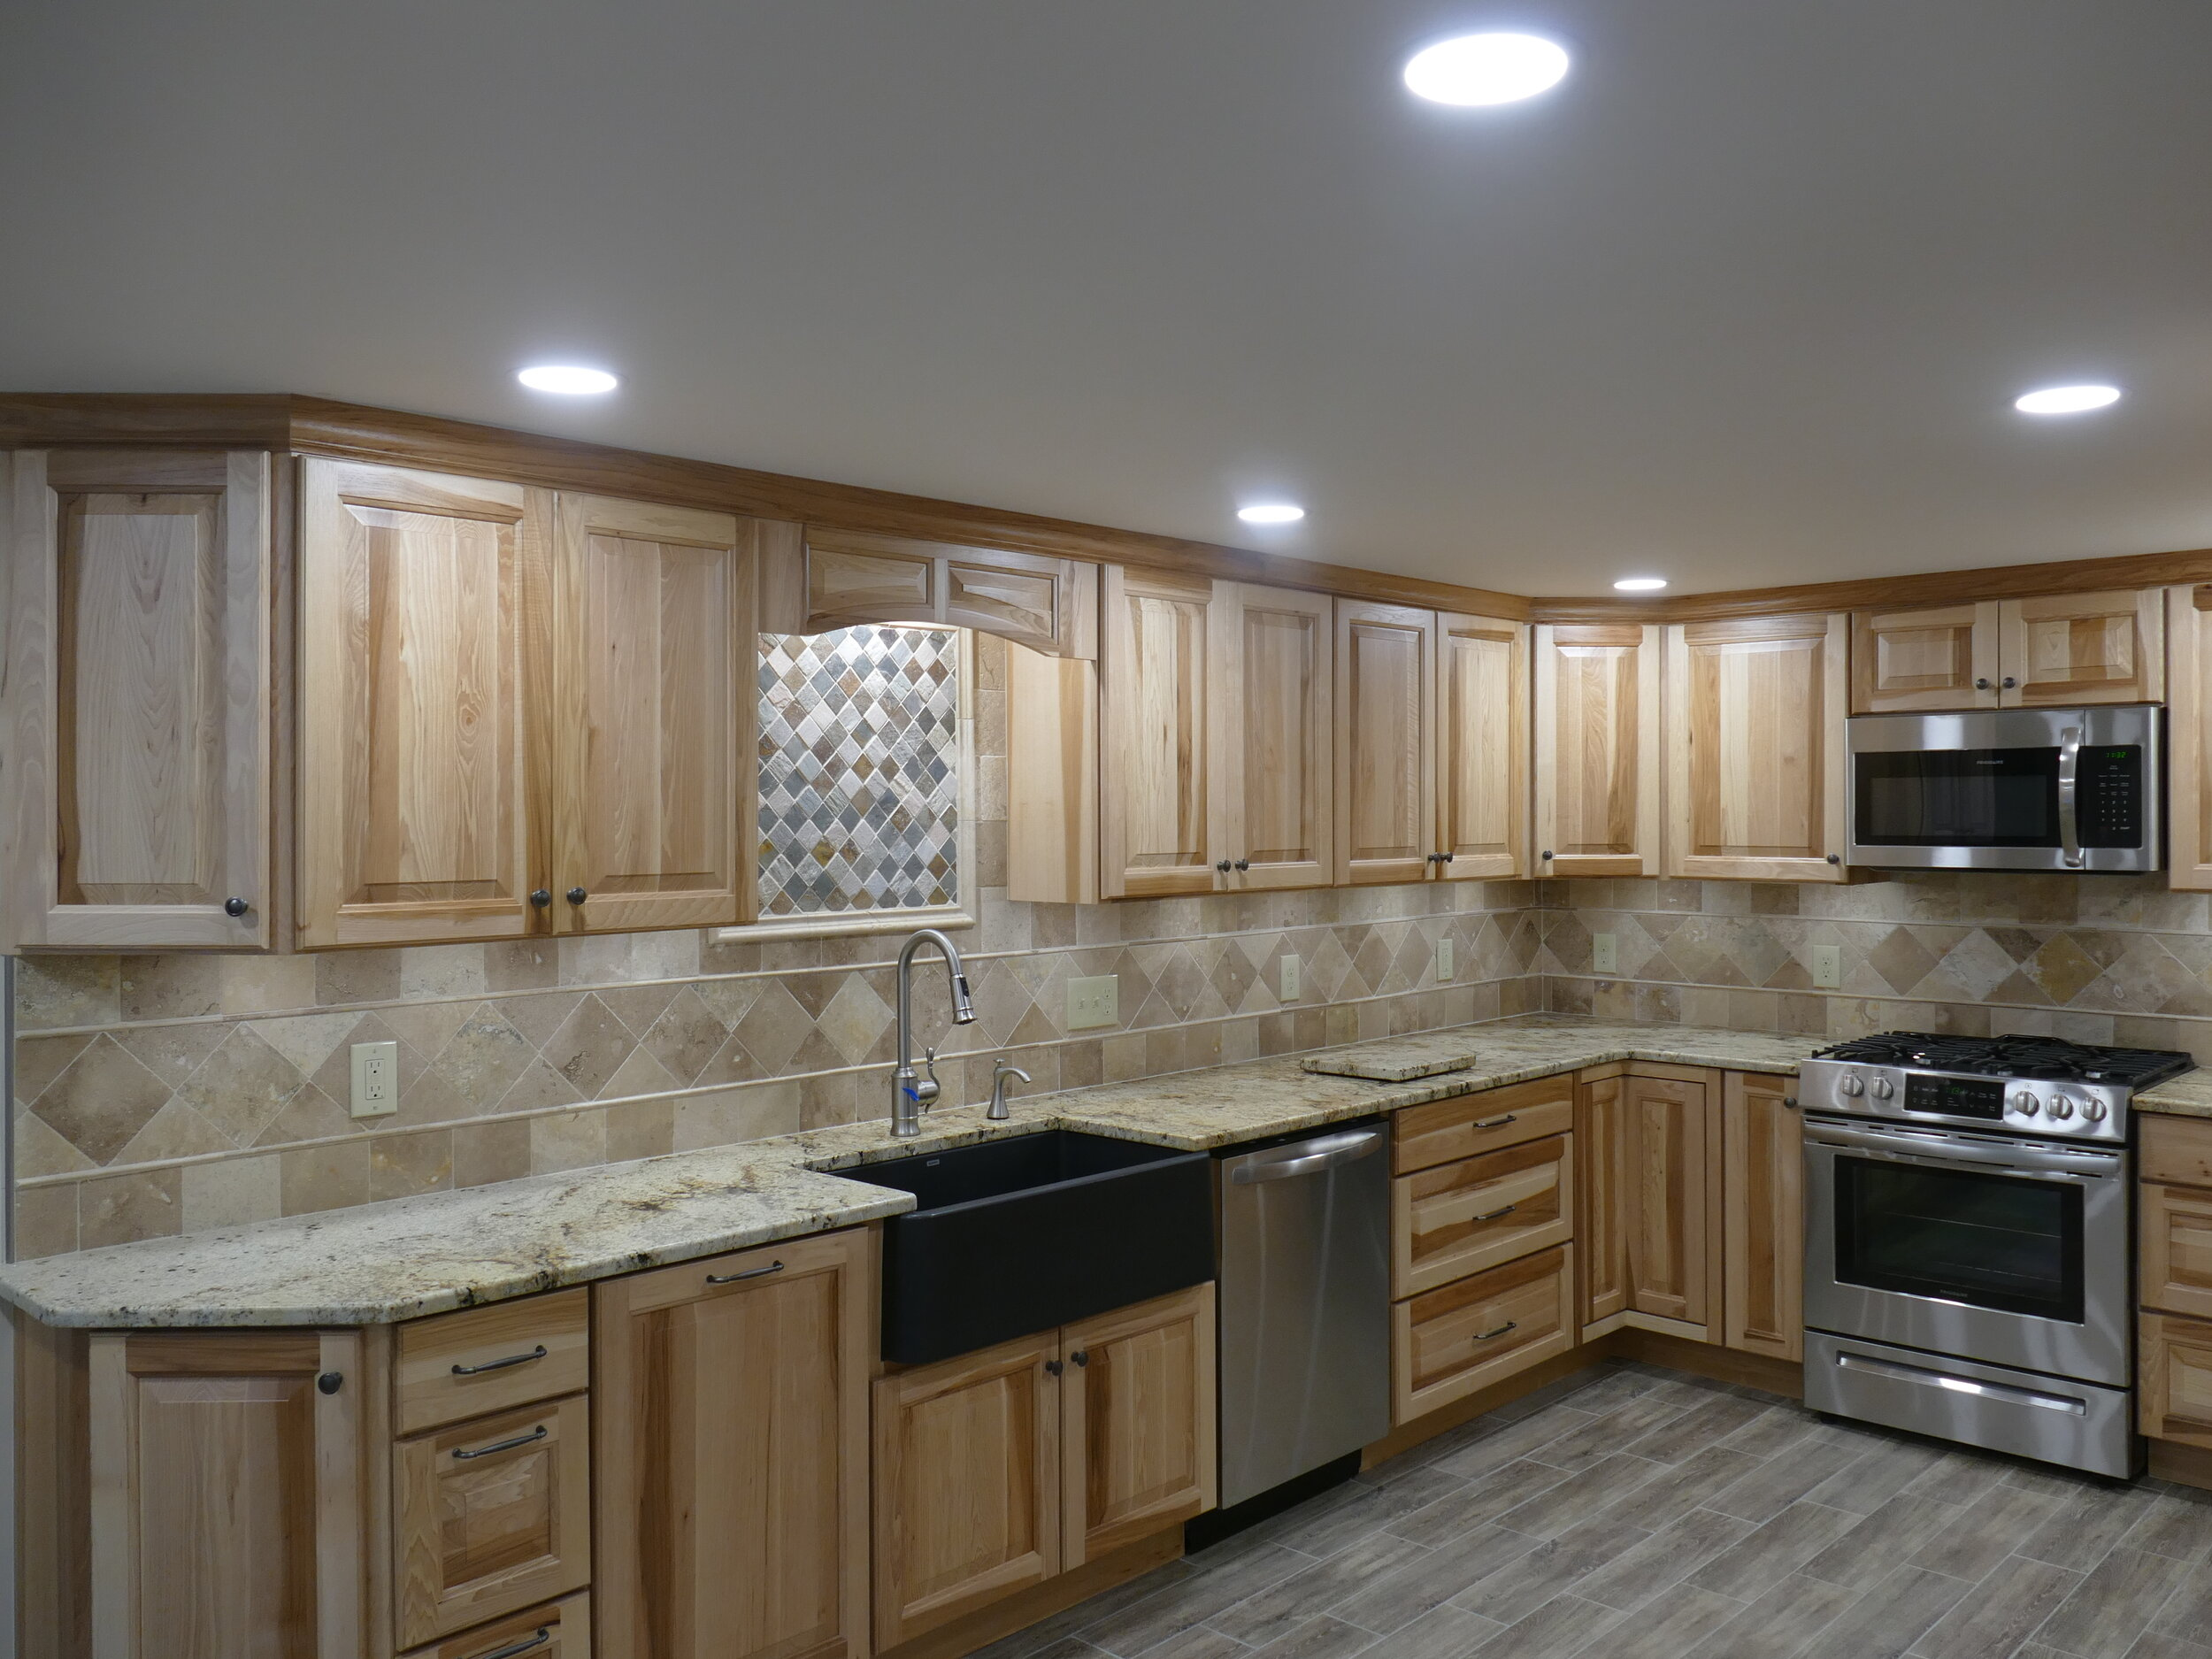 Full kitchen remodel with under cabinet lighting designed by Ink Design Concepts